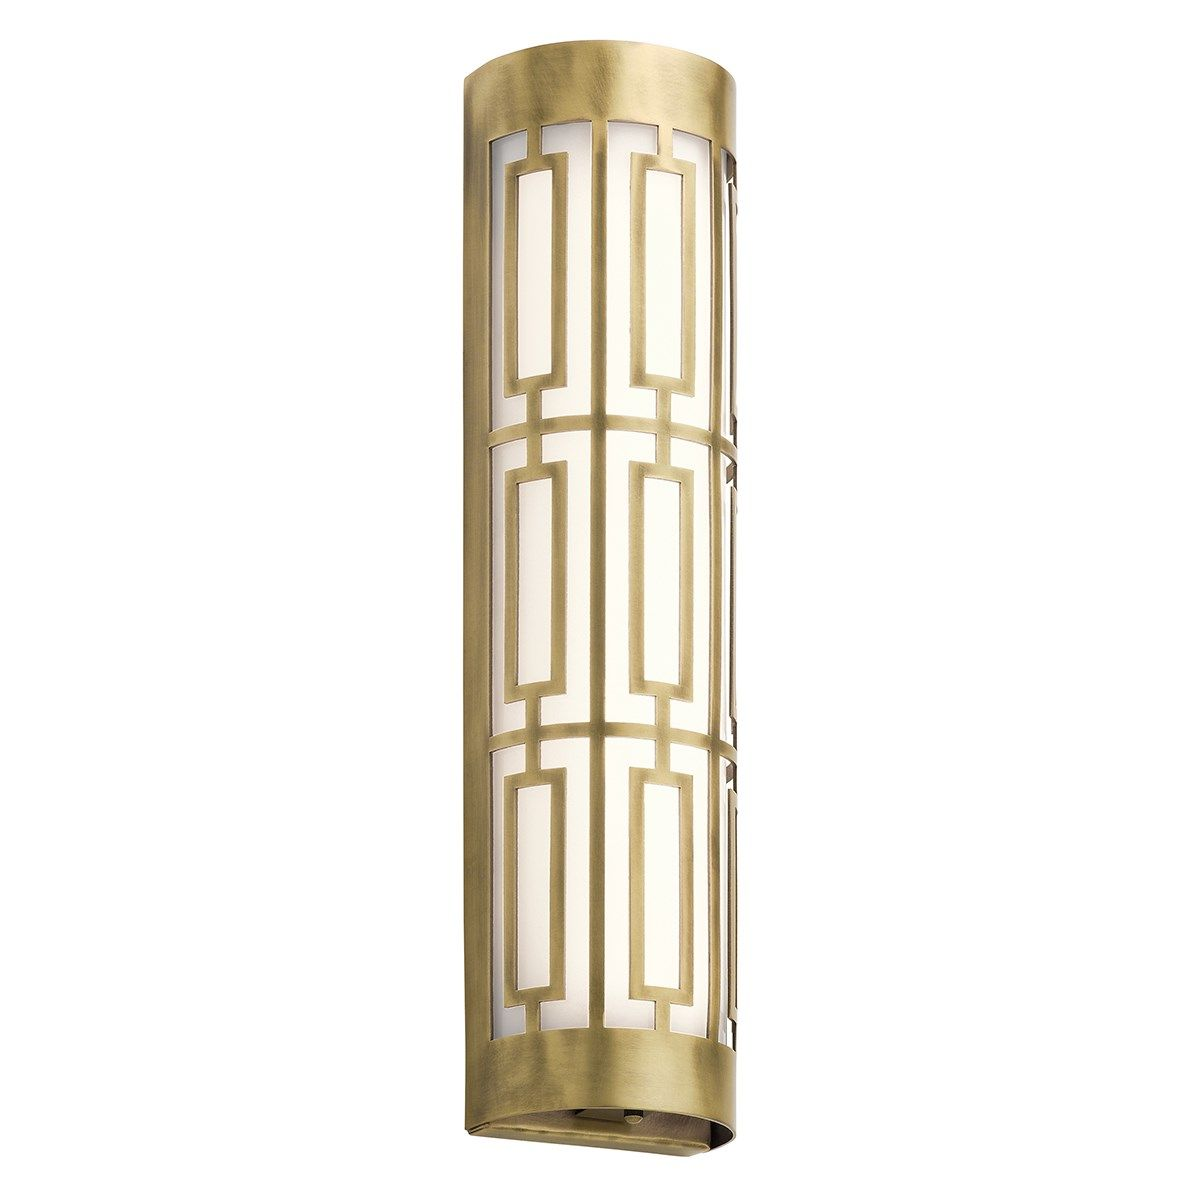 Empire 20 Led Linear Wall Sconce Natural Brass Kichler Lighting Led Bathroom Lights Bath Light Kichler Lighting